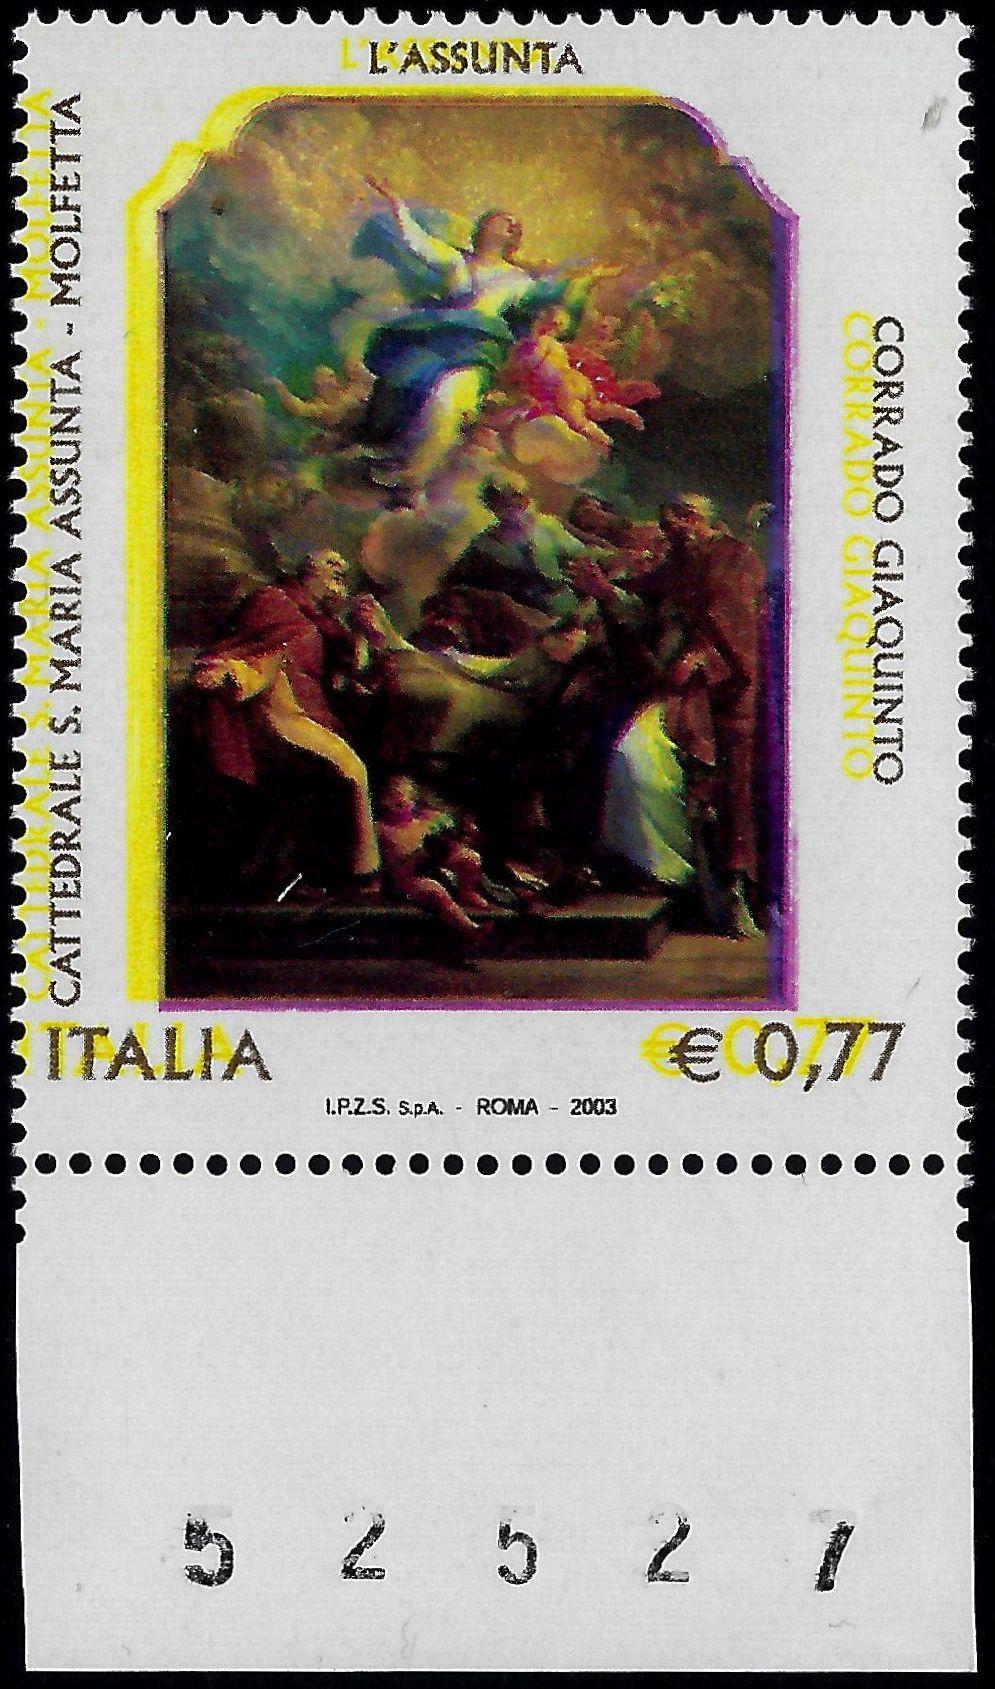 2003 Giaquinto varietà Ferrario